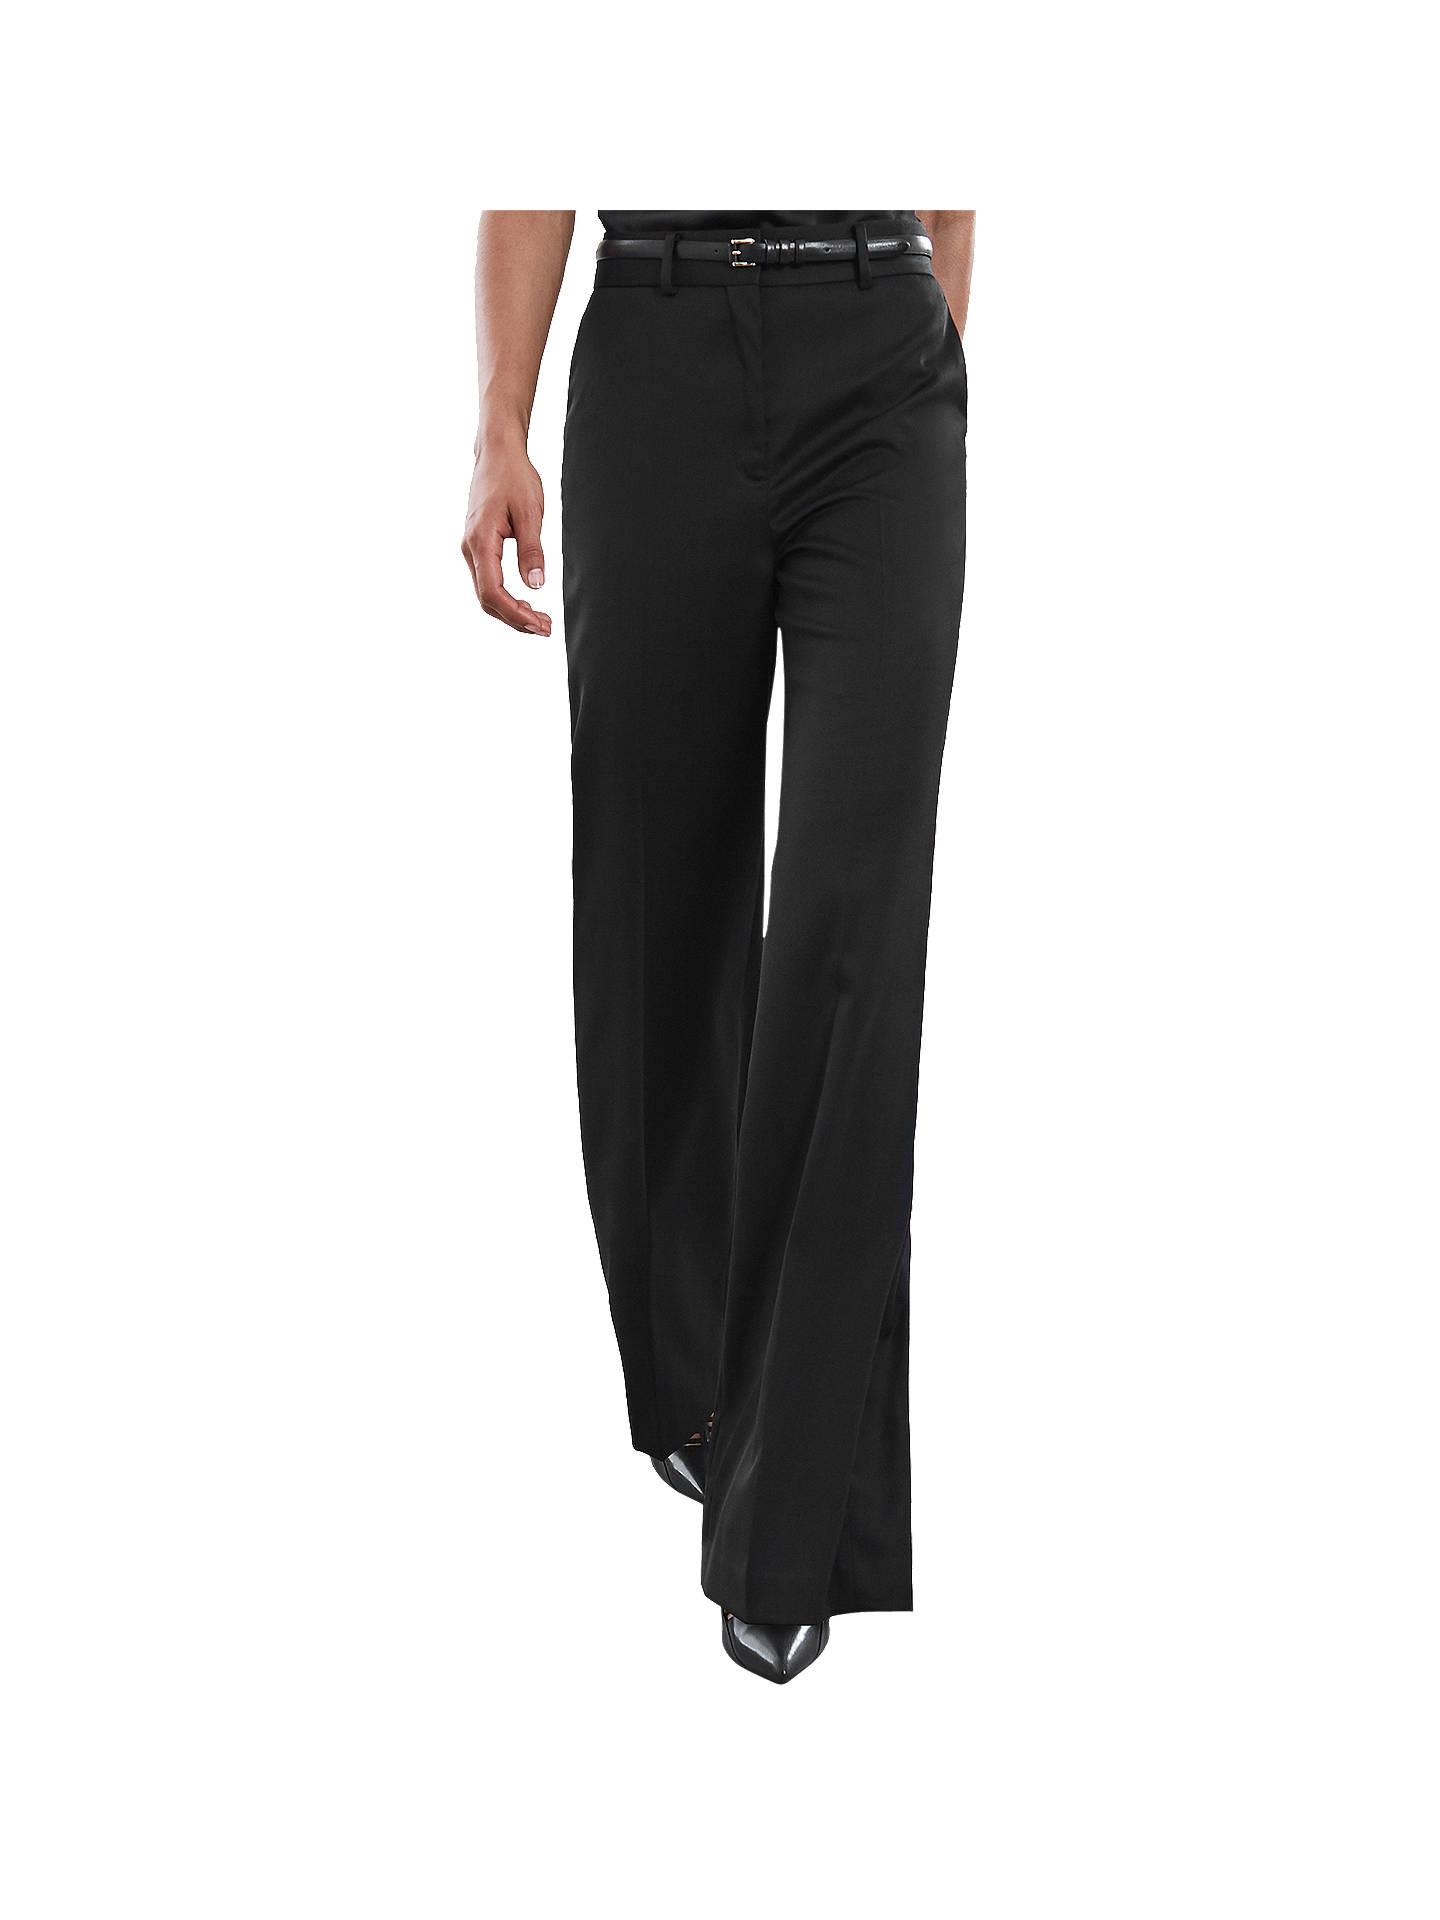 708aa5f8f0 Reiss Harper Wide Leg Trousers, Black at John Lewis & Partners